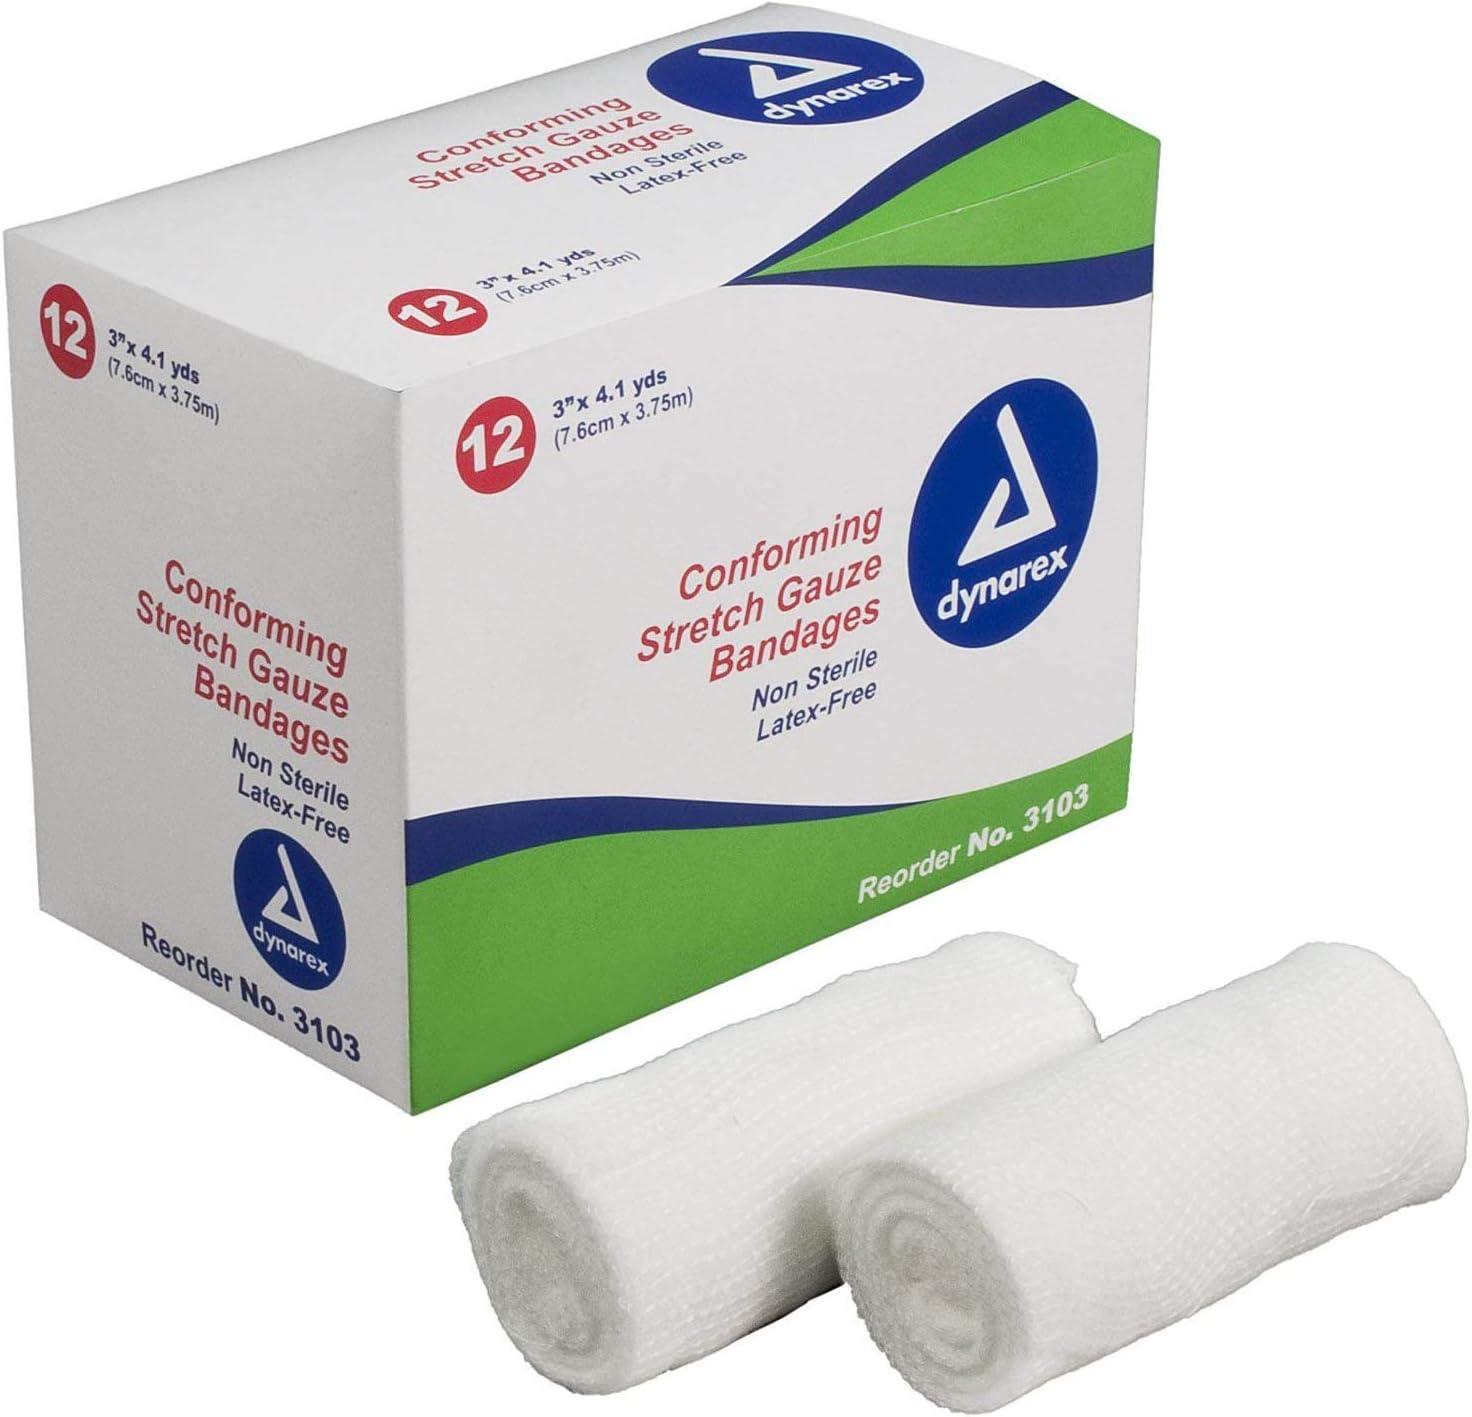 Dynarex Stretch Gauze Bandage Roll Box Non-Sterile 3